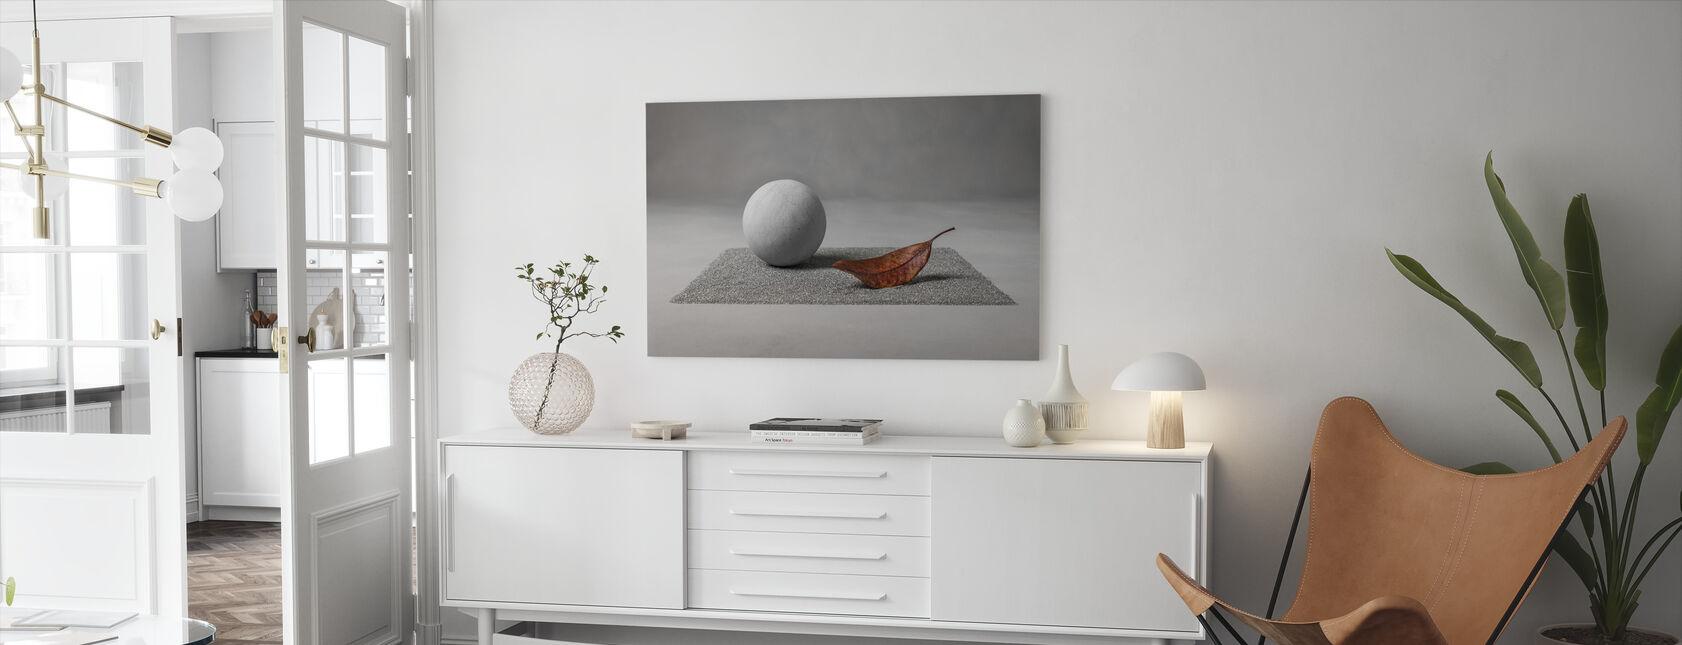 Månen Landing - Canvastavla - Vardagsrum